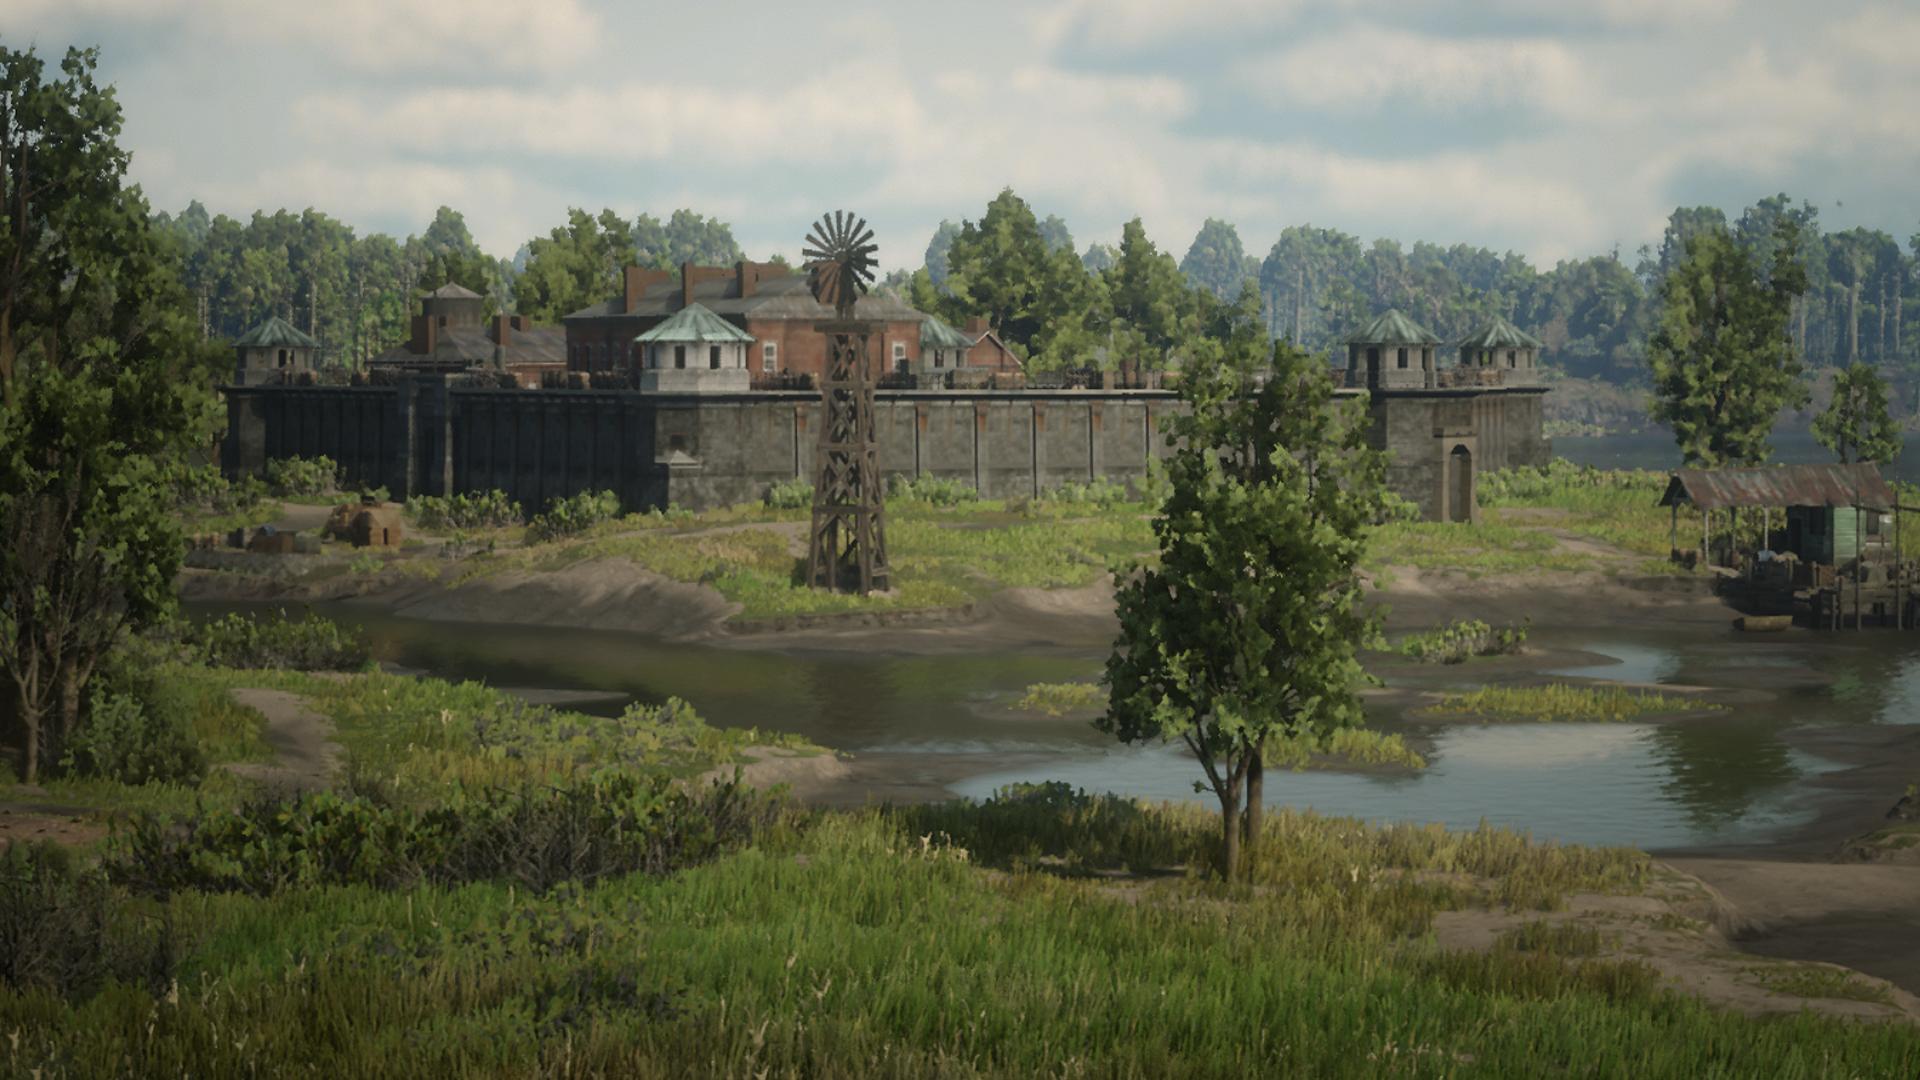 Penitenciaría de Sisika